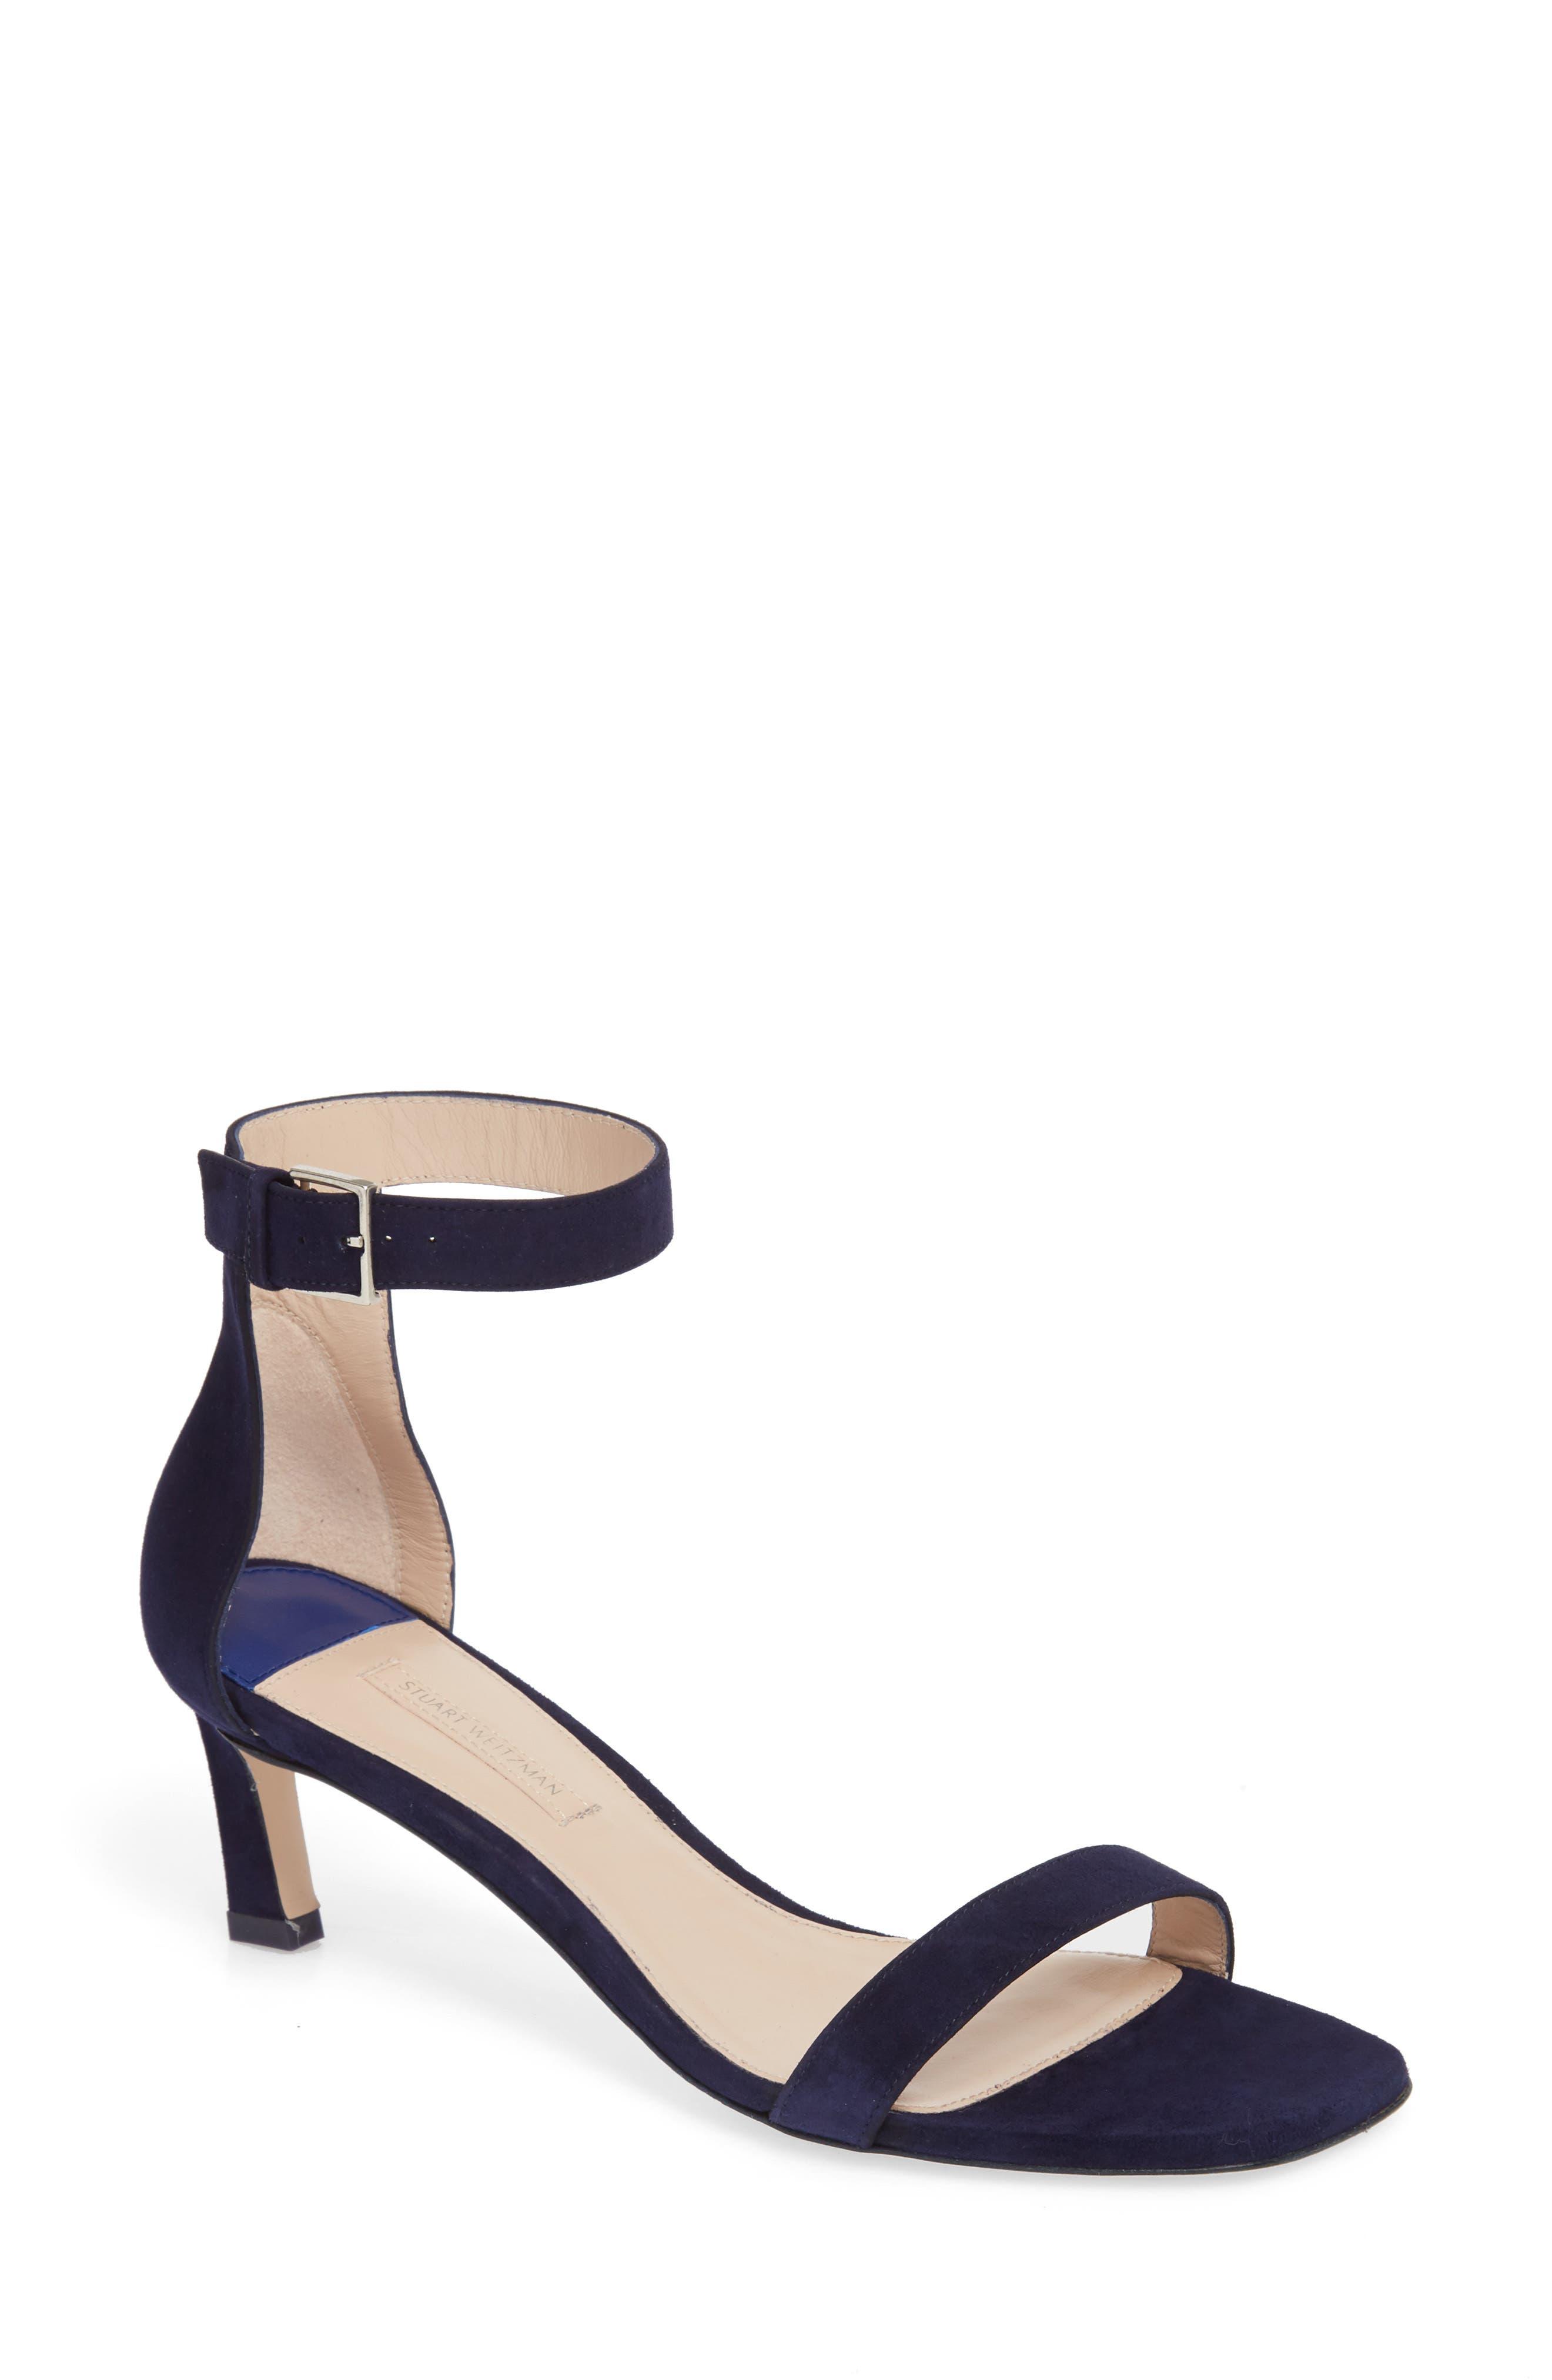 Stuart Weitzman 45SQUARENUDIST Ankle Strap Sandal (Women)